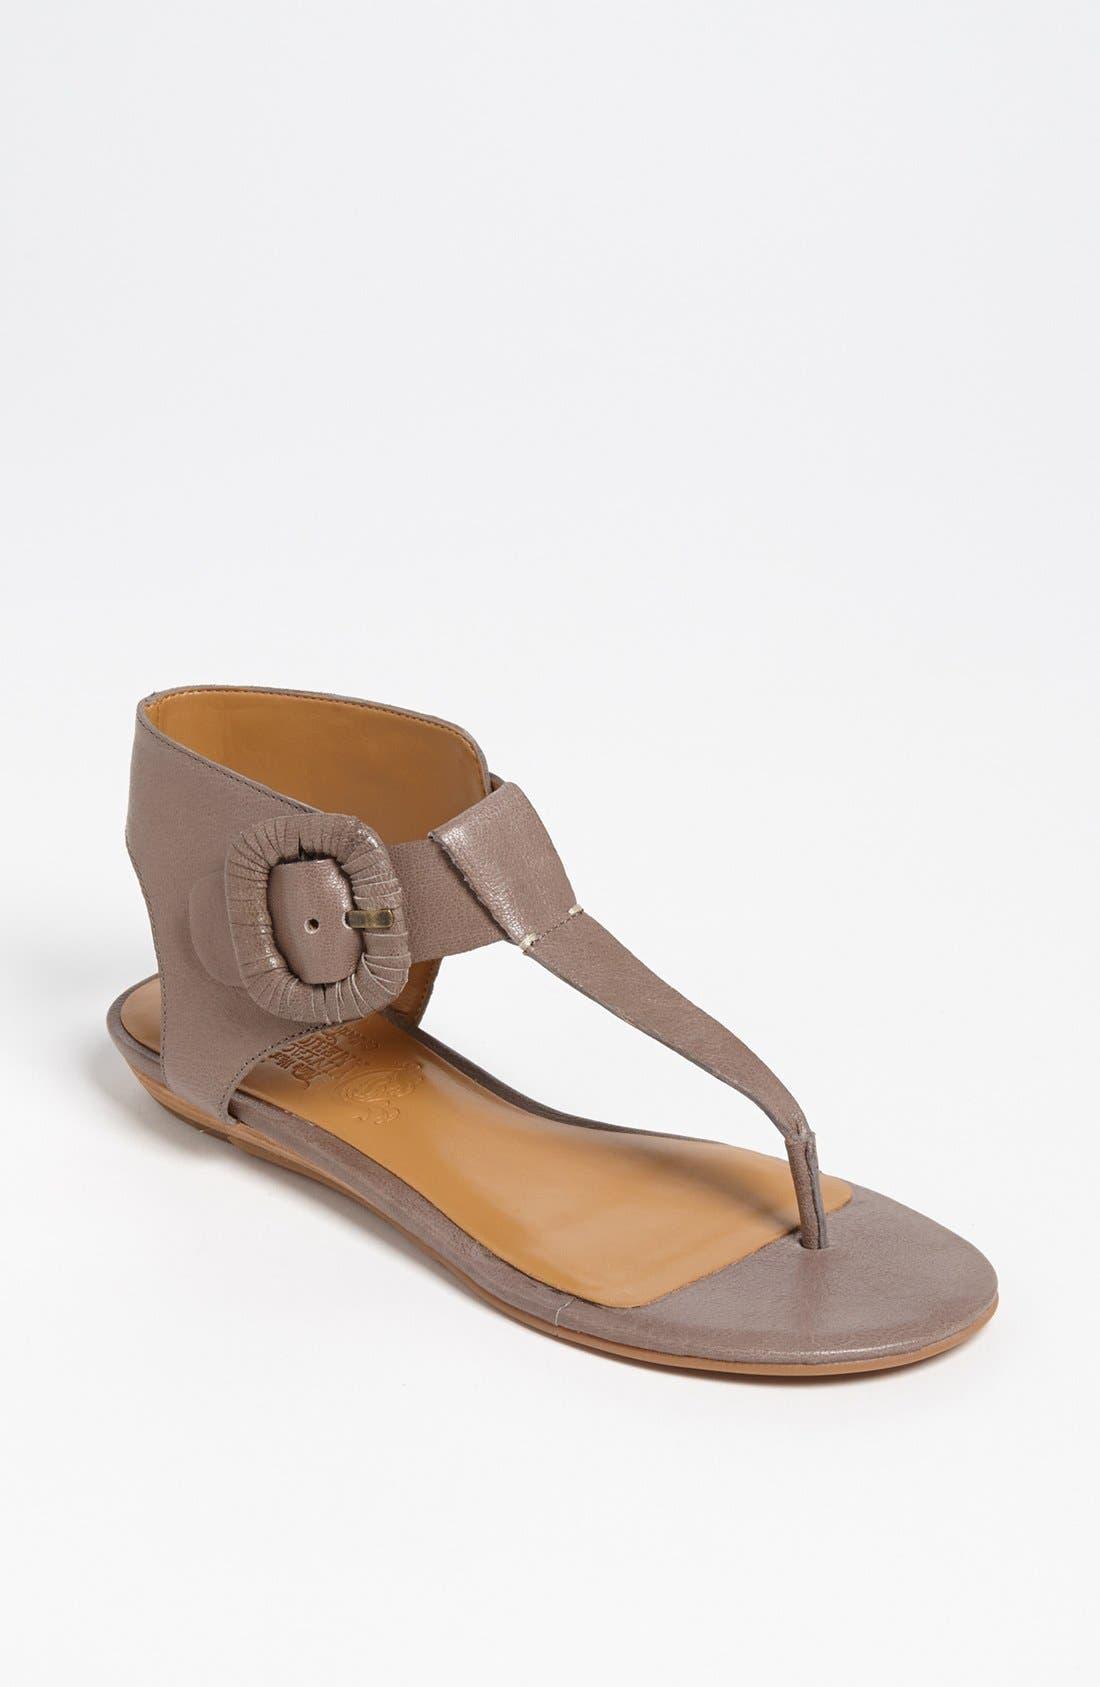 Main Image - Nine West 'Wiloh' Sandal